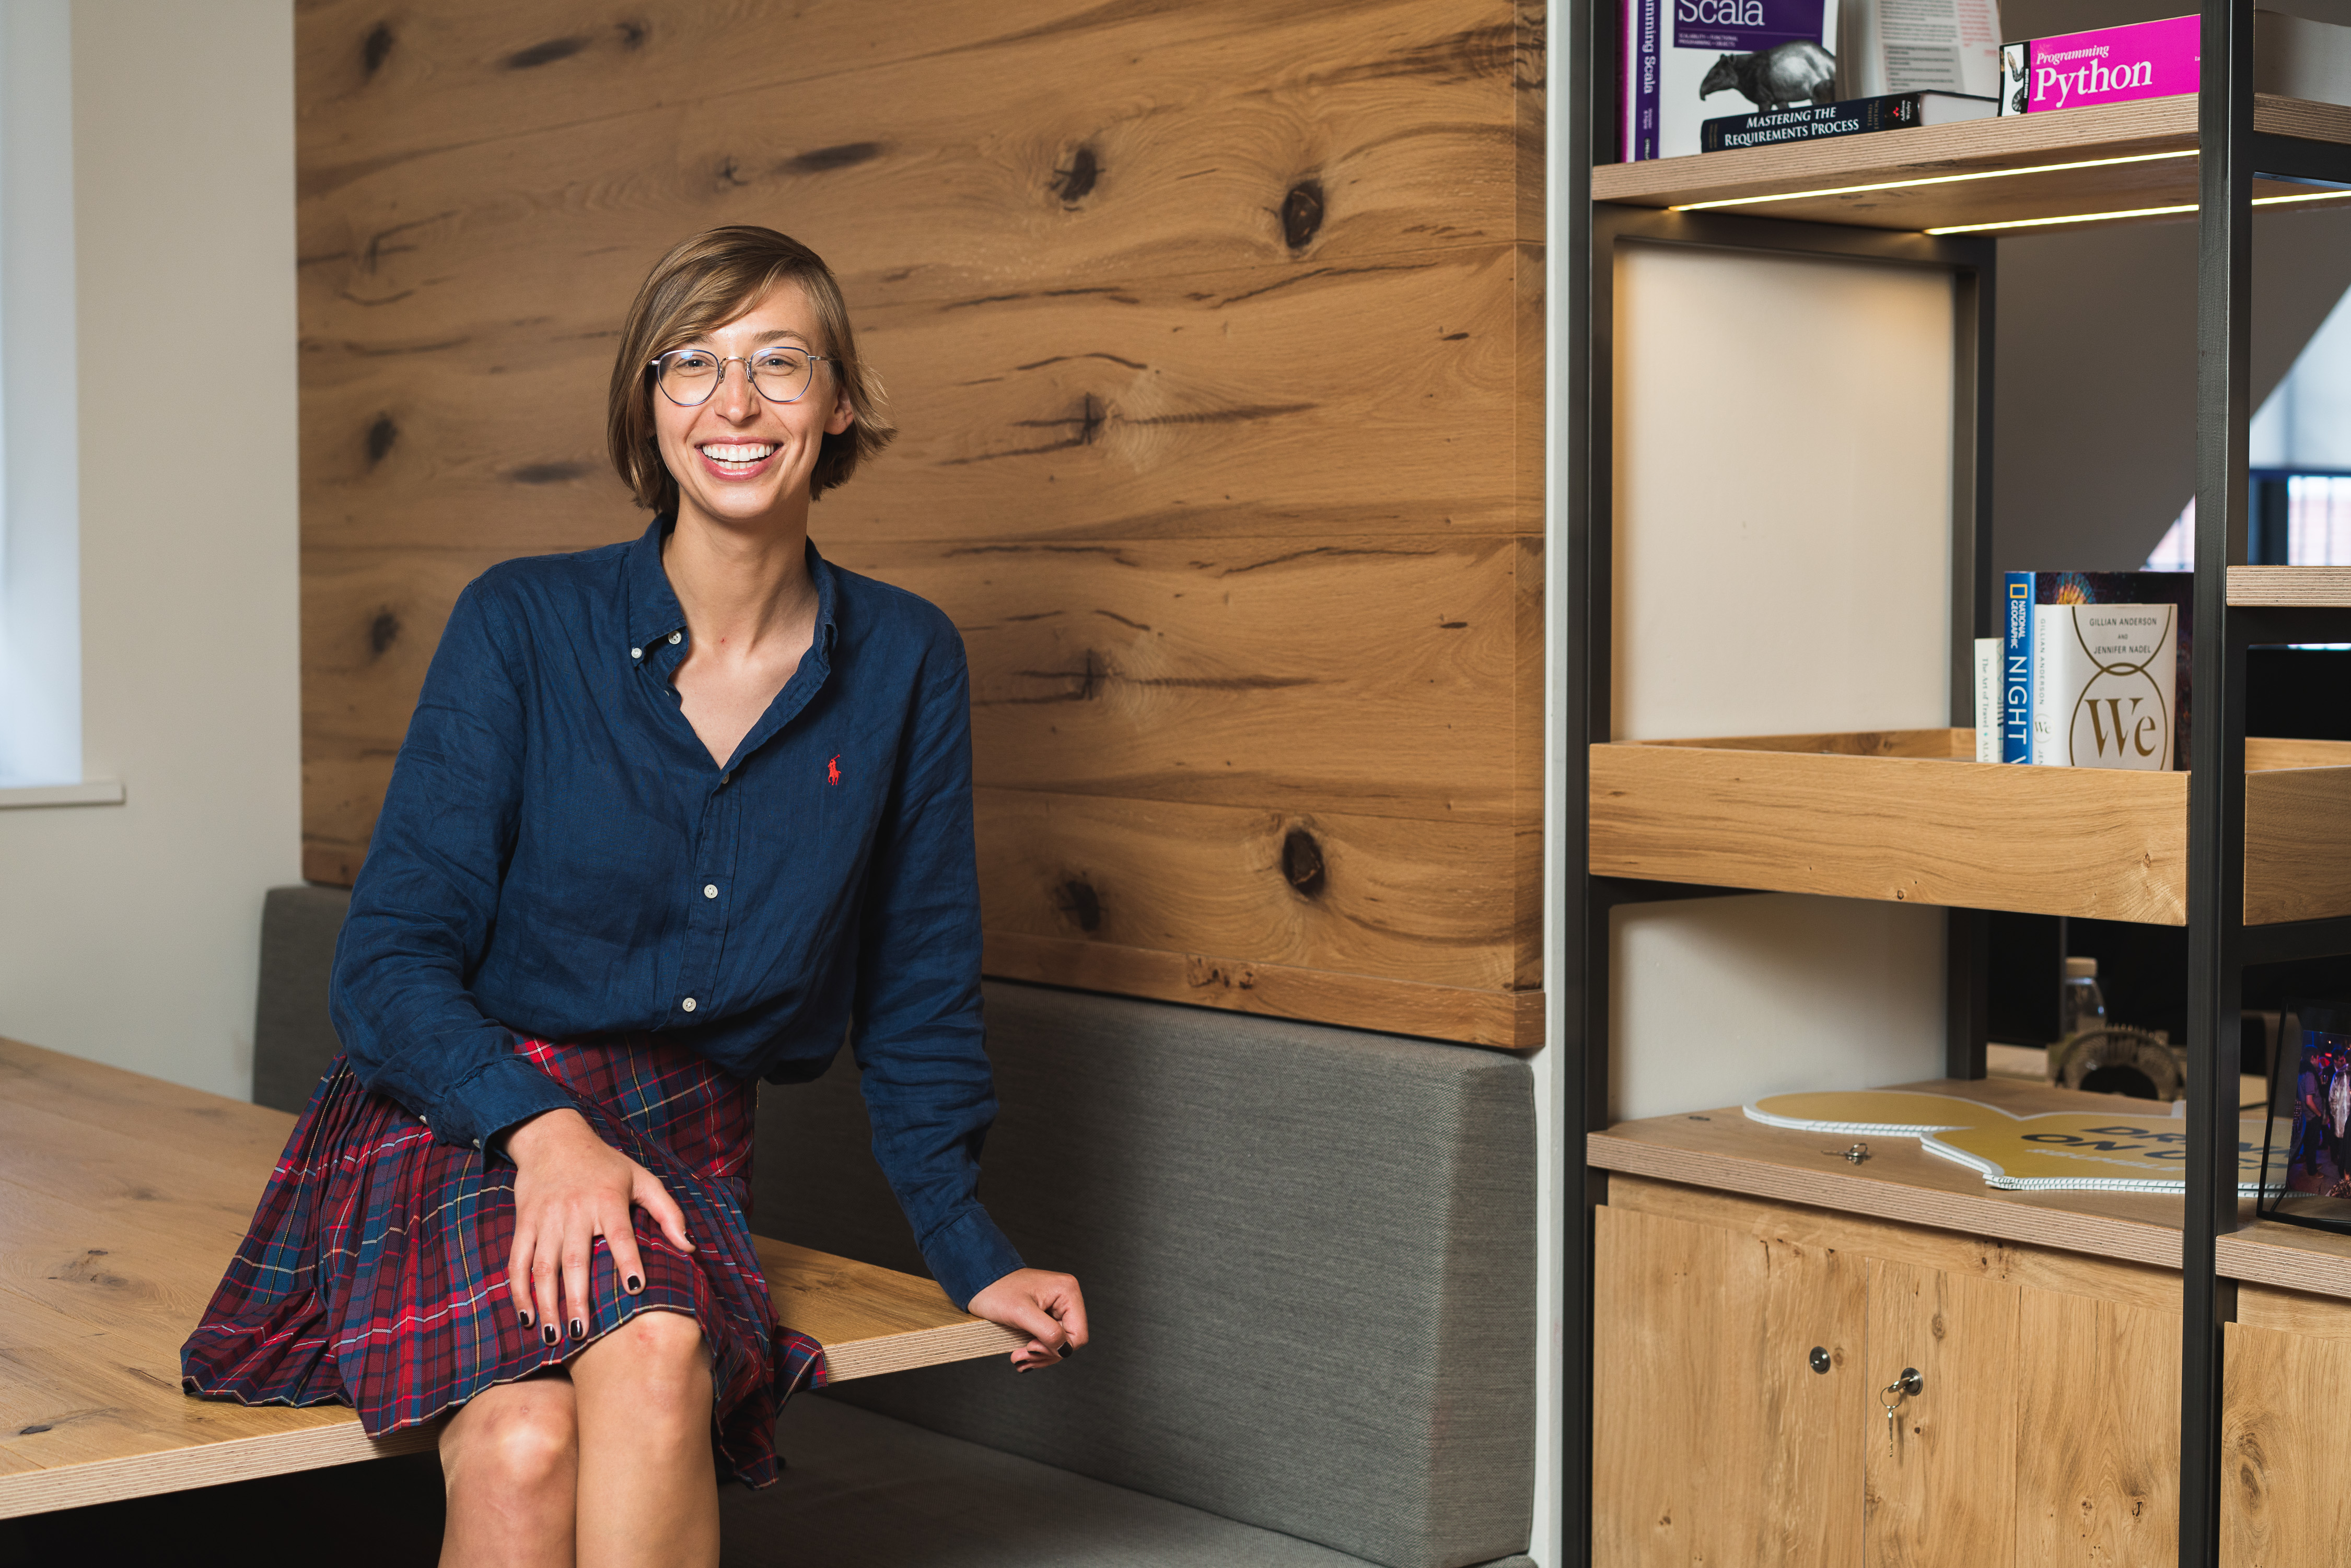 Interview: Meet Badoo's Head of Growth Marketing